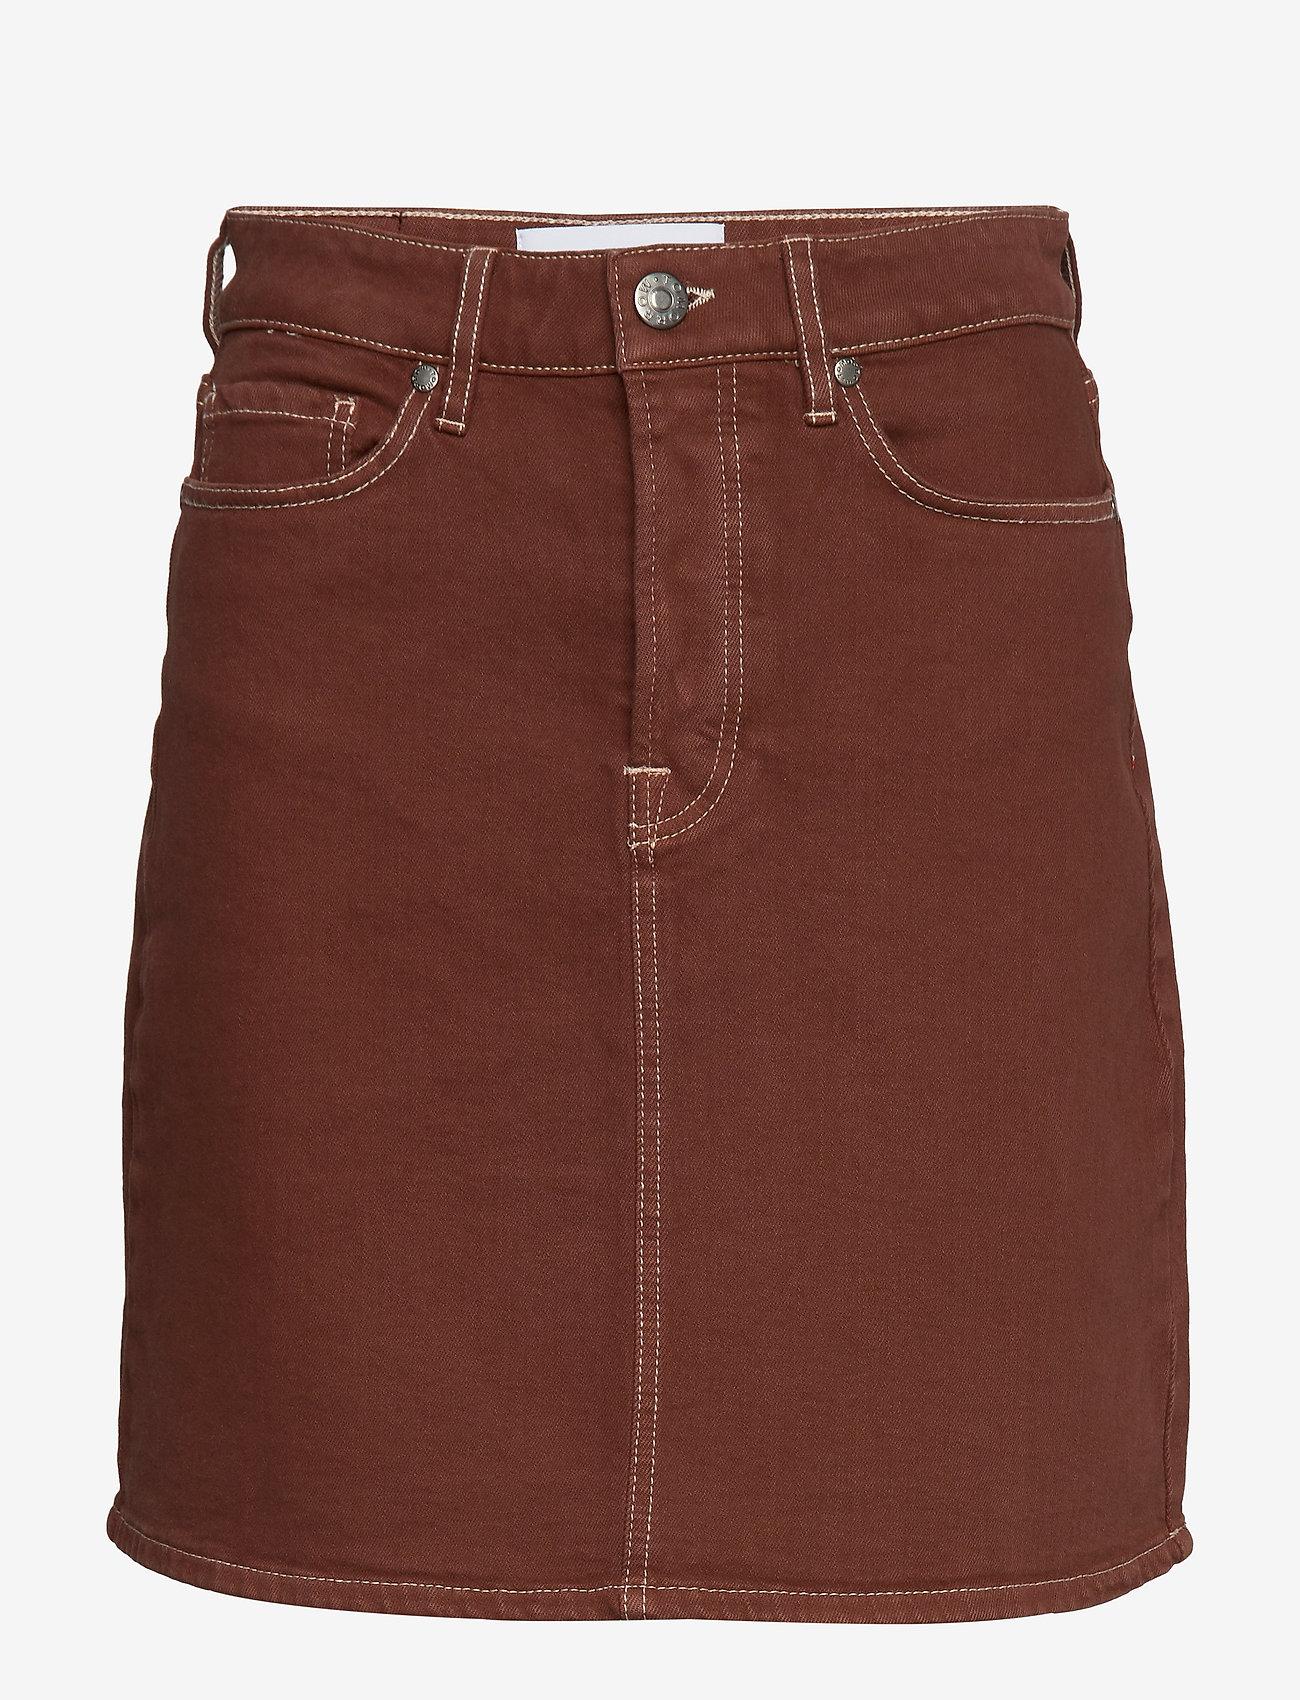 Tomorrow - Mandela denim skirt color - kurze röcke - coffee brown - 0